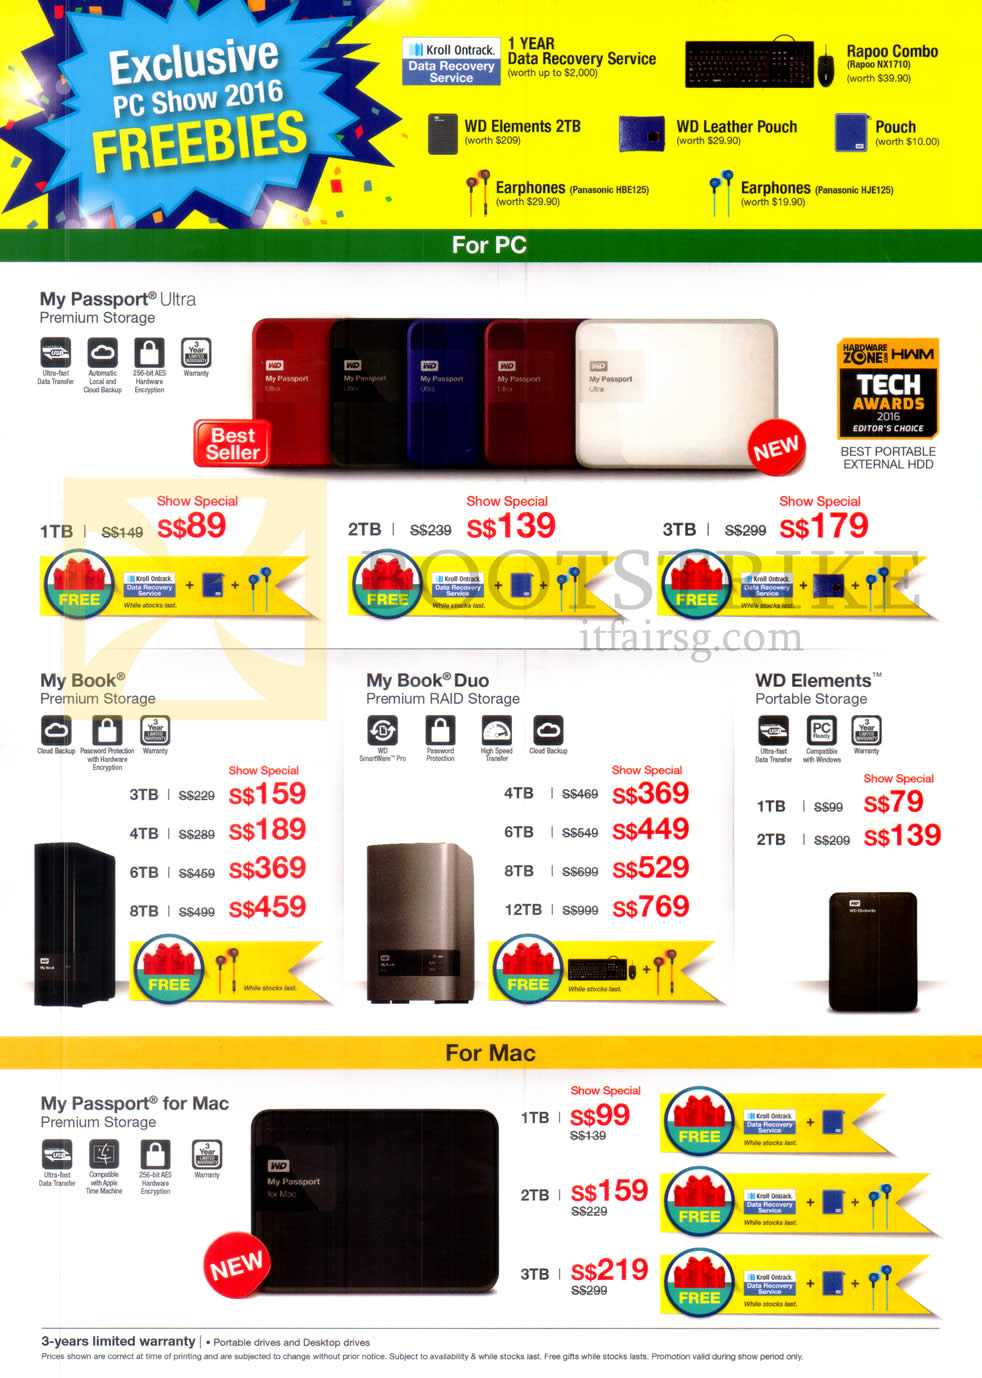 PC SHOW 2016 price list image brochure of Western Digital External Hard Disk Drives My Passport Ultra, My Book, Duo, Elements, My Passport For Mac, 1TB, 2TB, 3TB, 4TB, 6TB, 8TB, 12TB